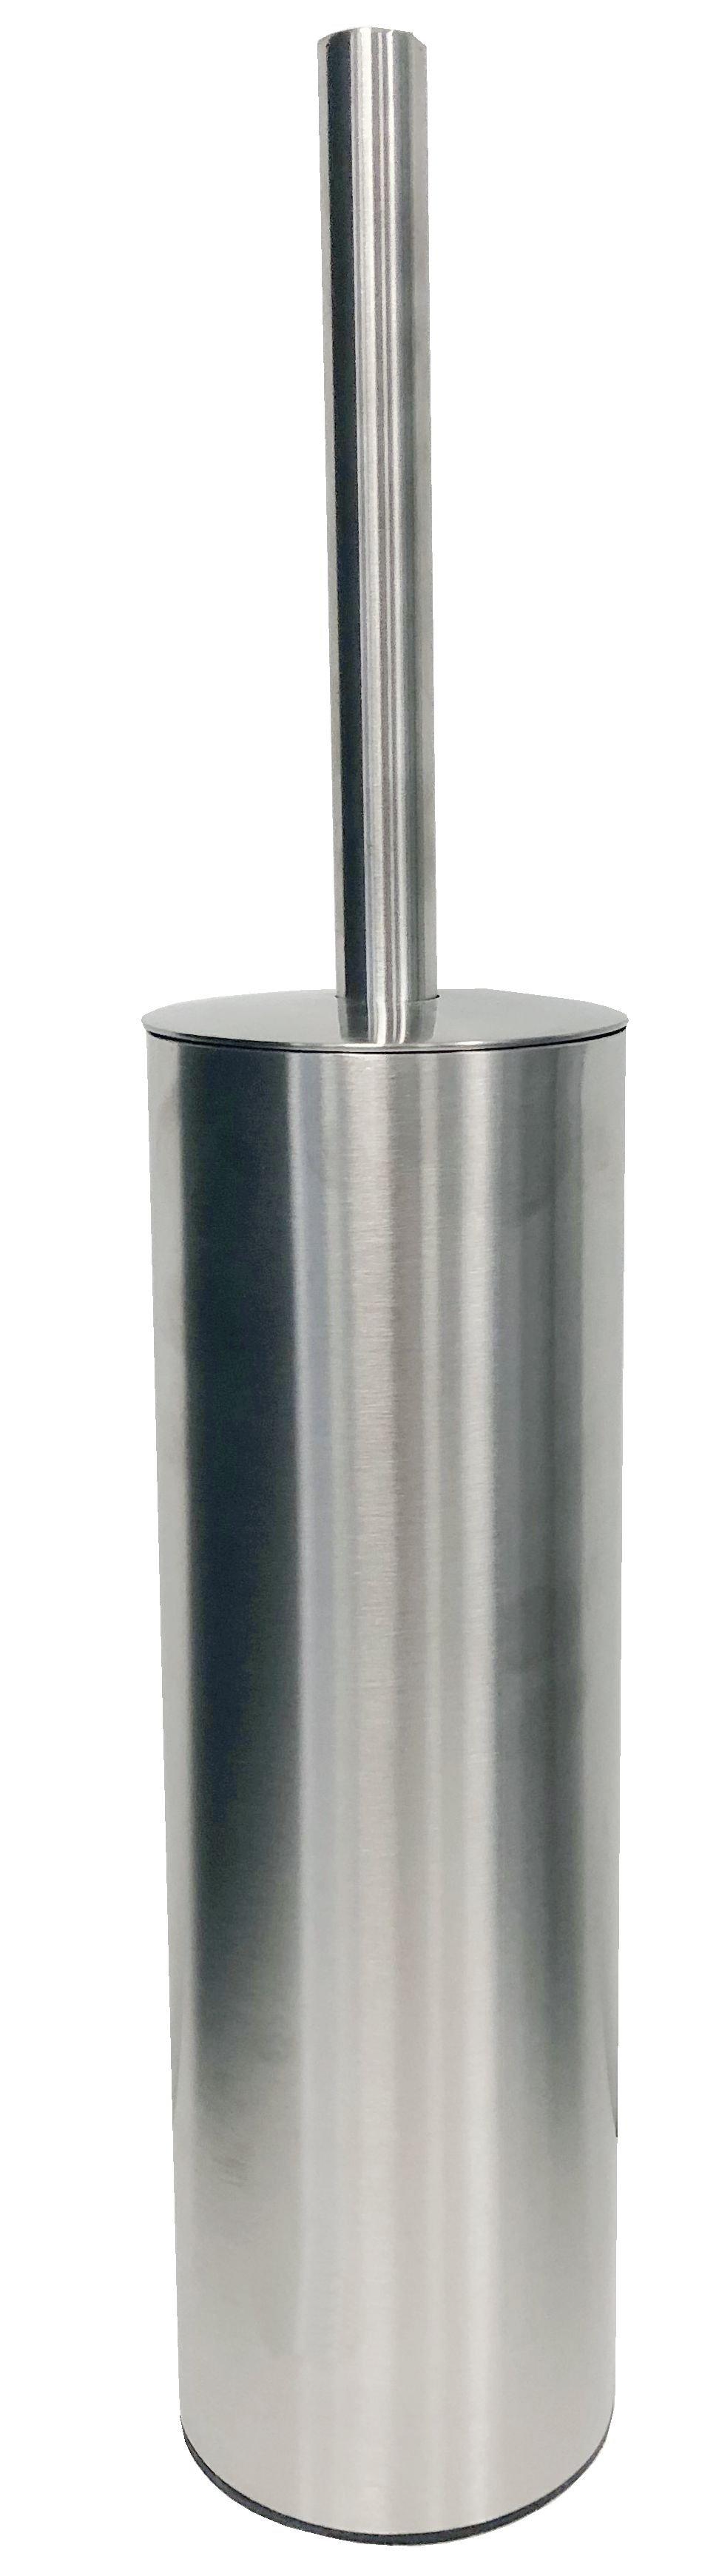 Wiesbaden wandmodel toiletborstelhouder 304 RVS